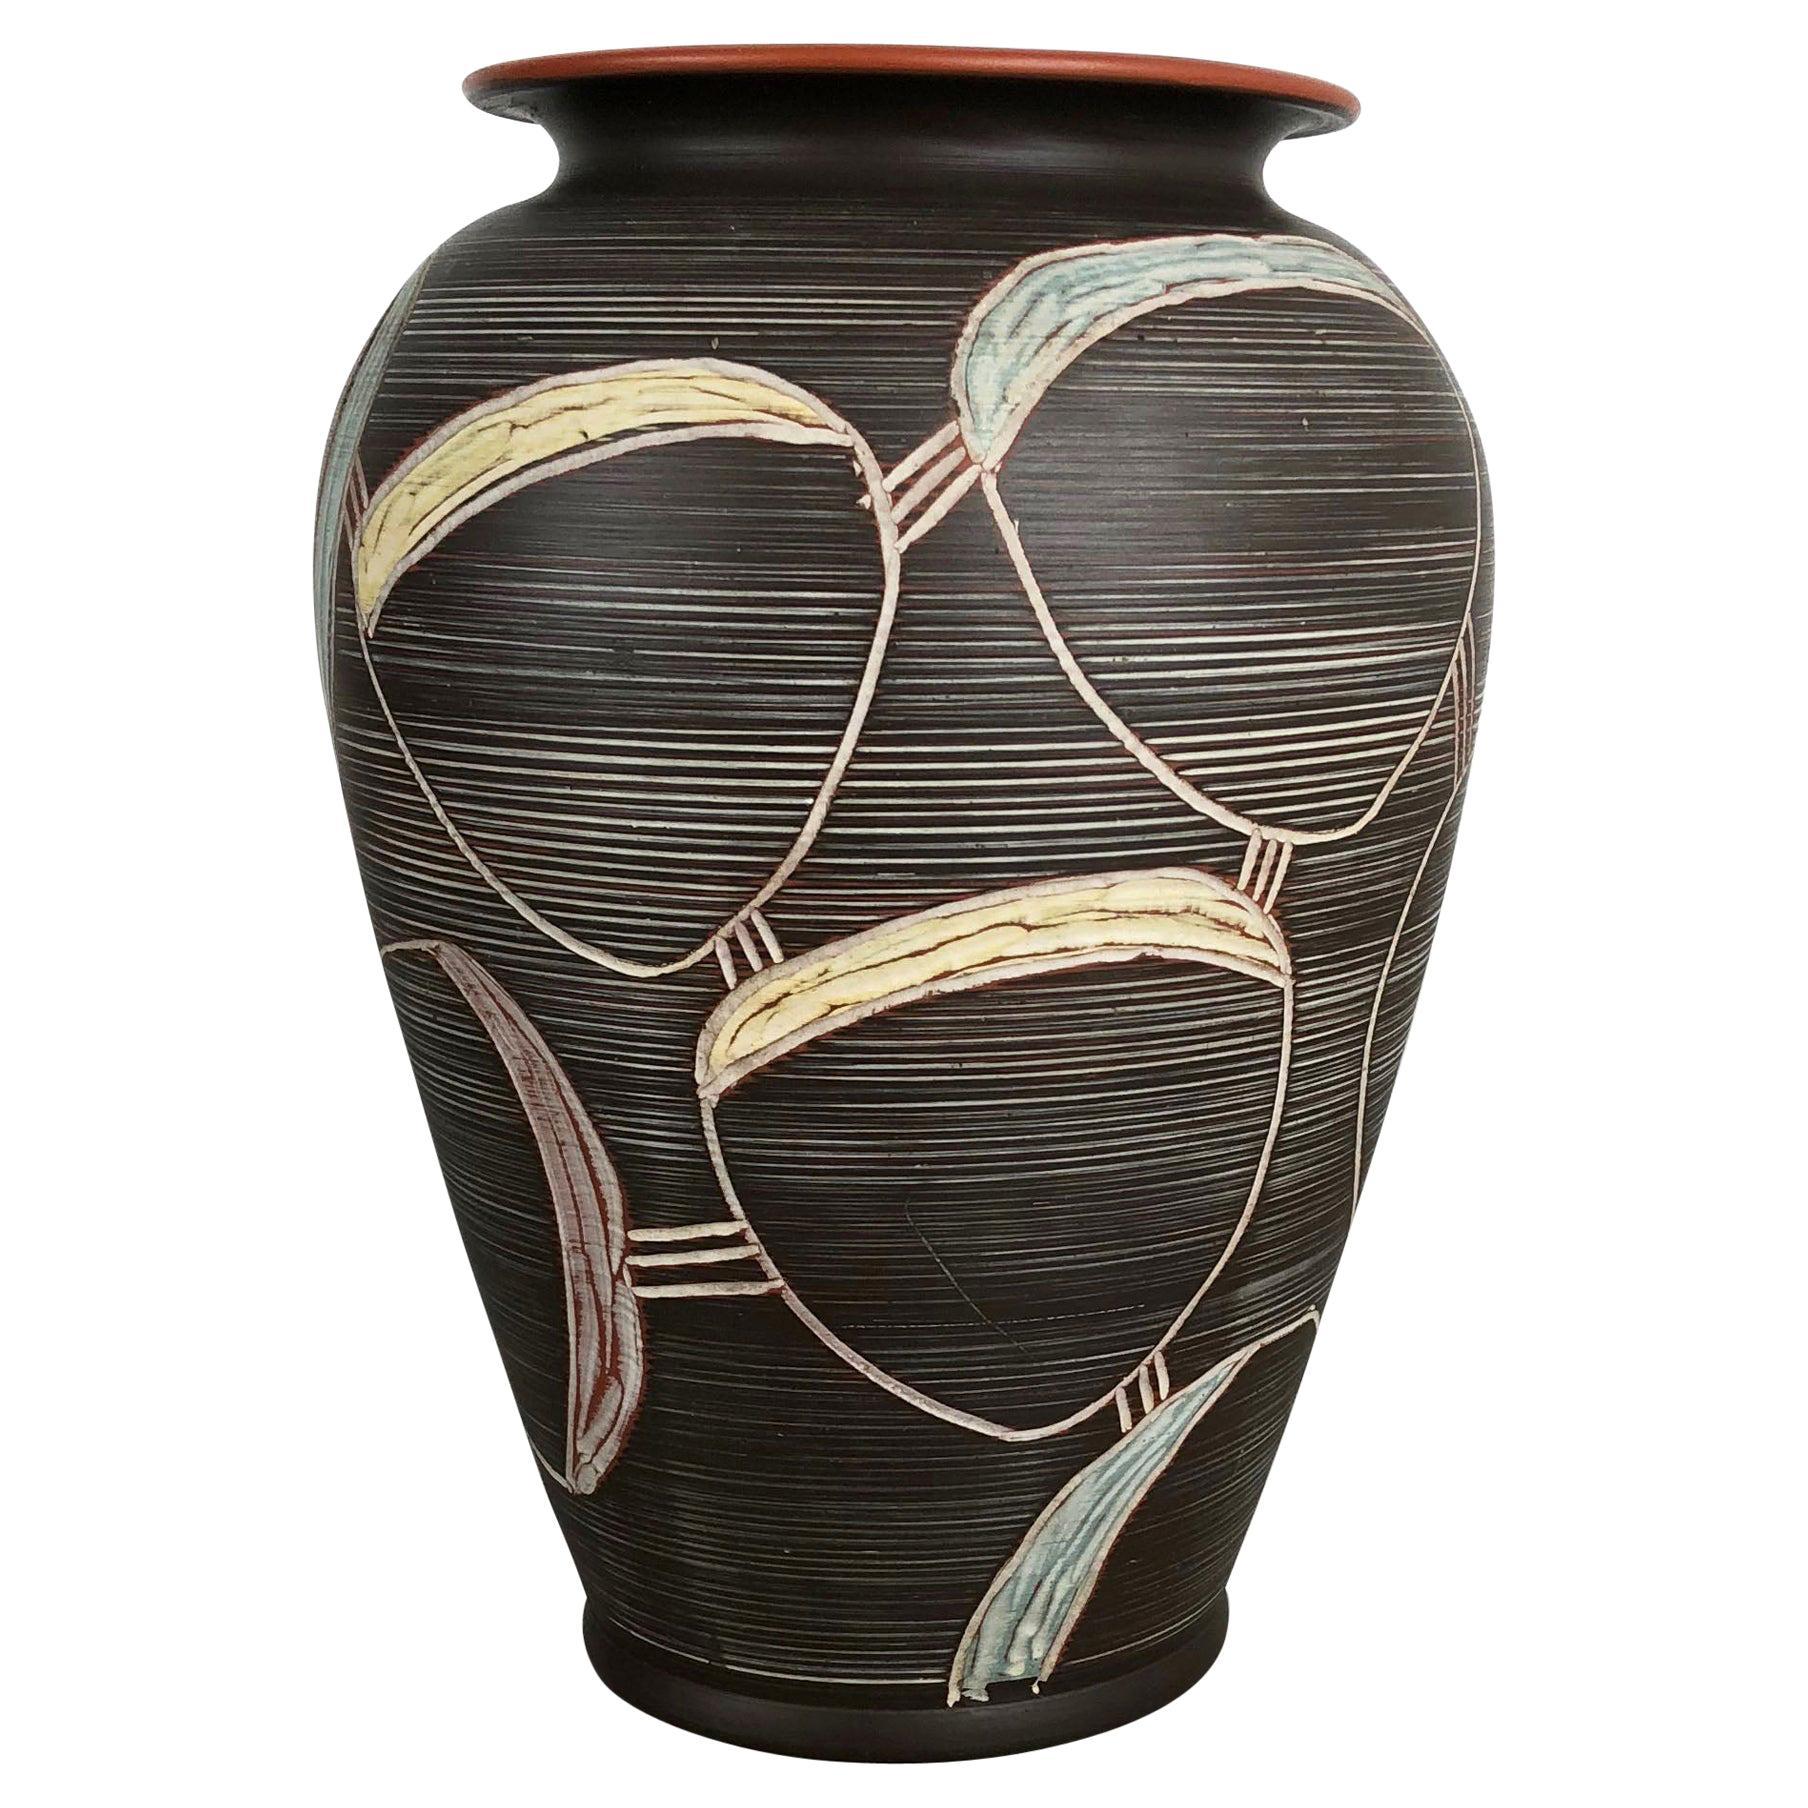 Large Abstract Ceramic Pottery Vase by Sawa Franz Schwaderlapp, Germany, 1950s